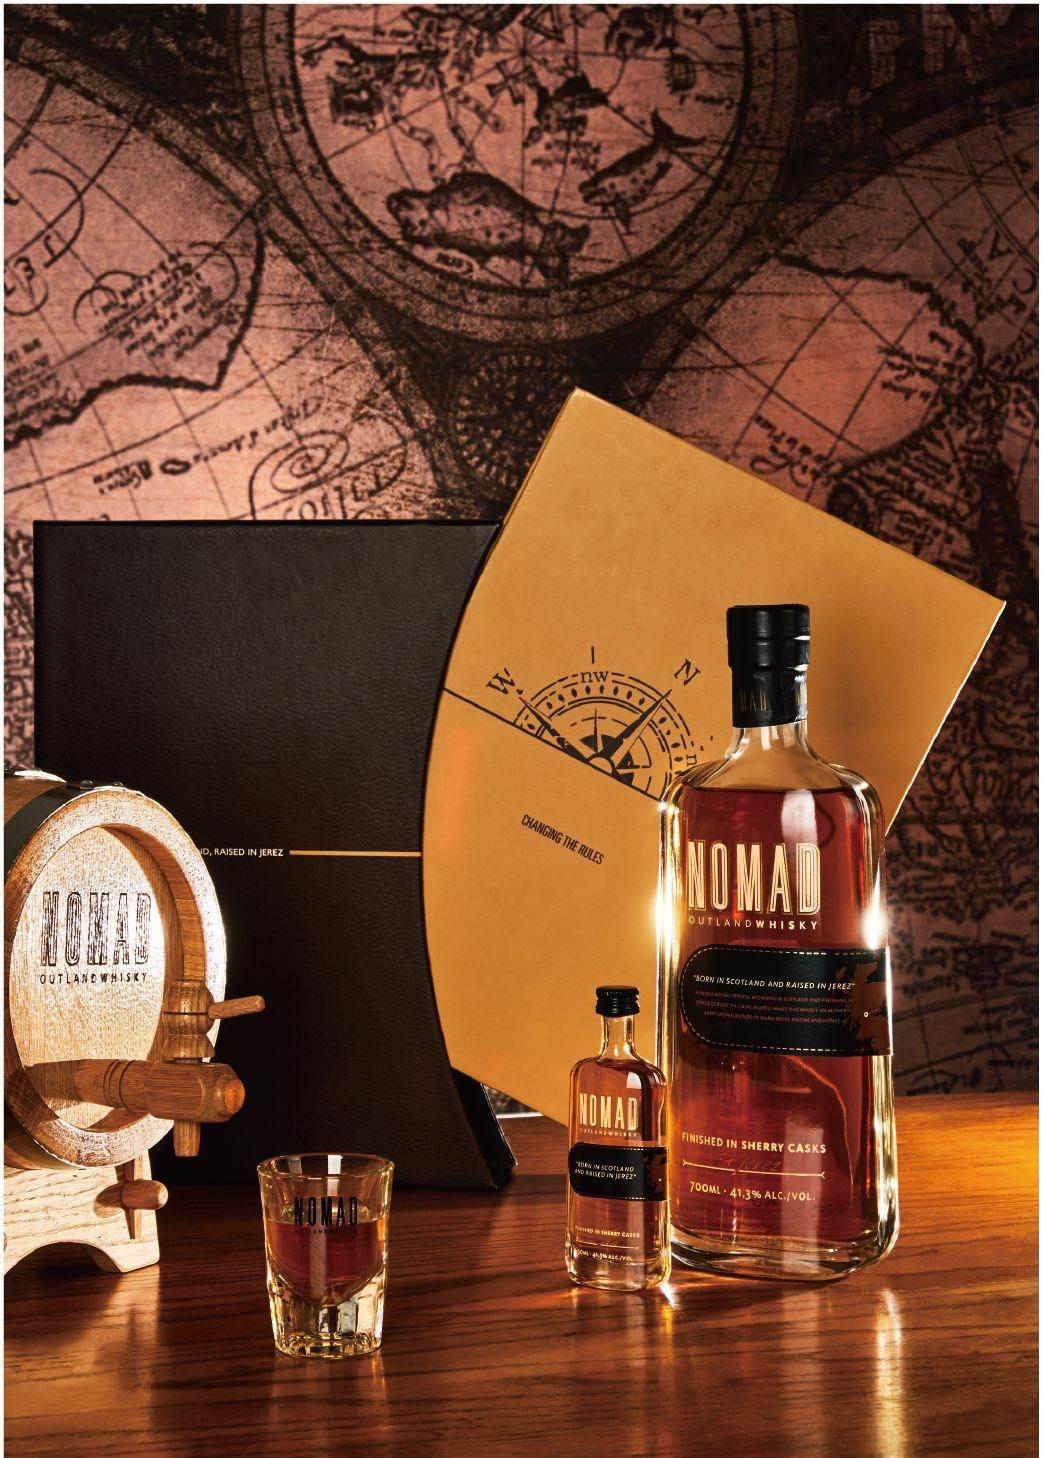 nomad雪莉雙桶威士忌書形禮盒建議售價1250元。業者/提供